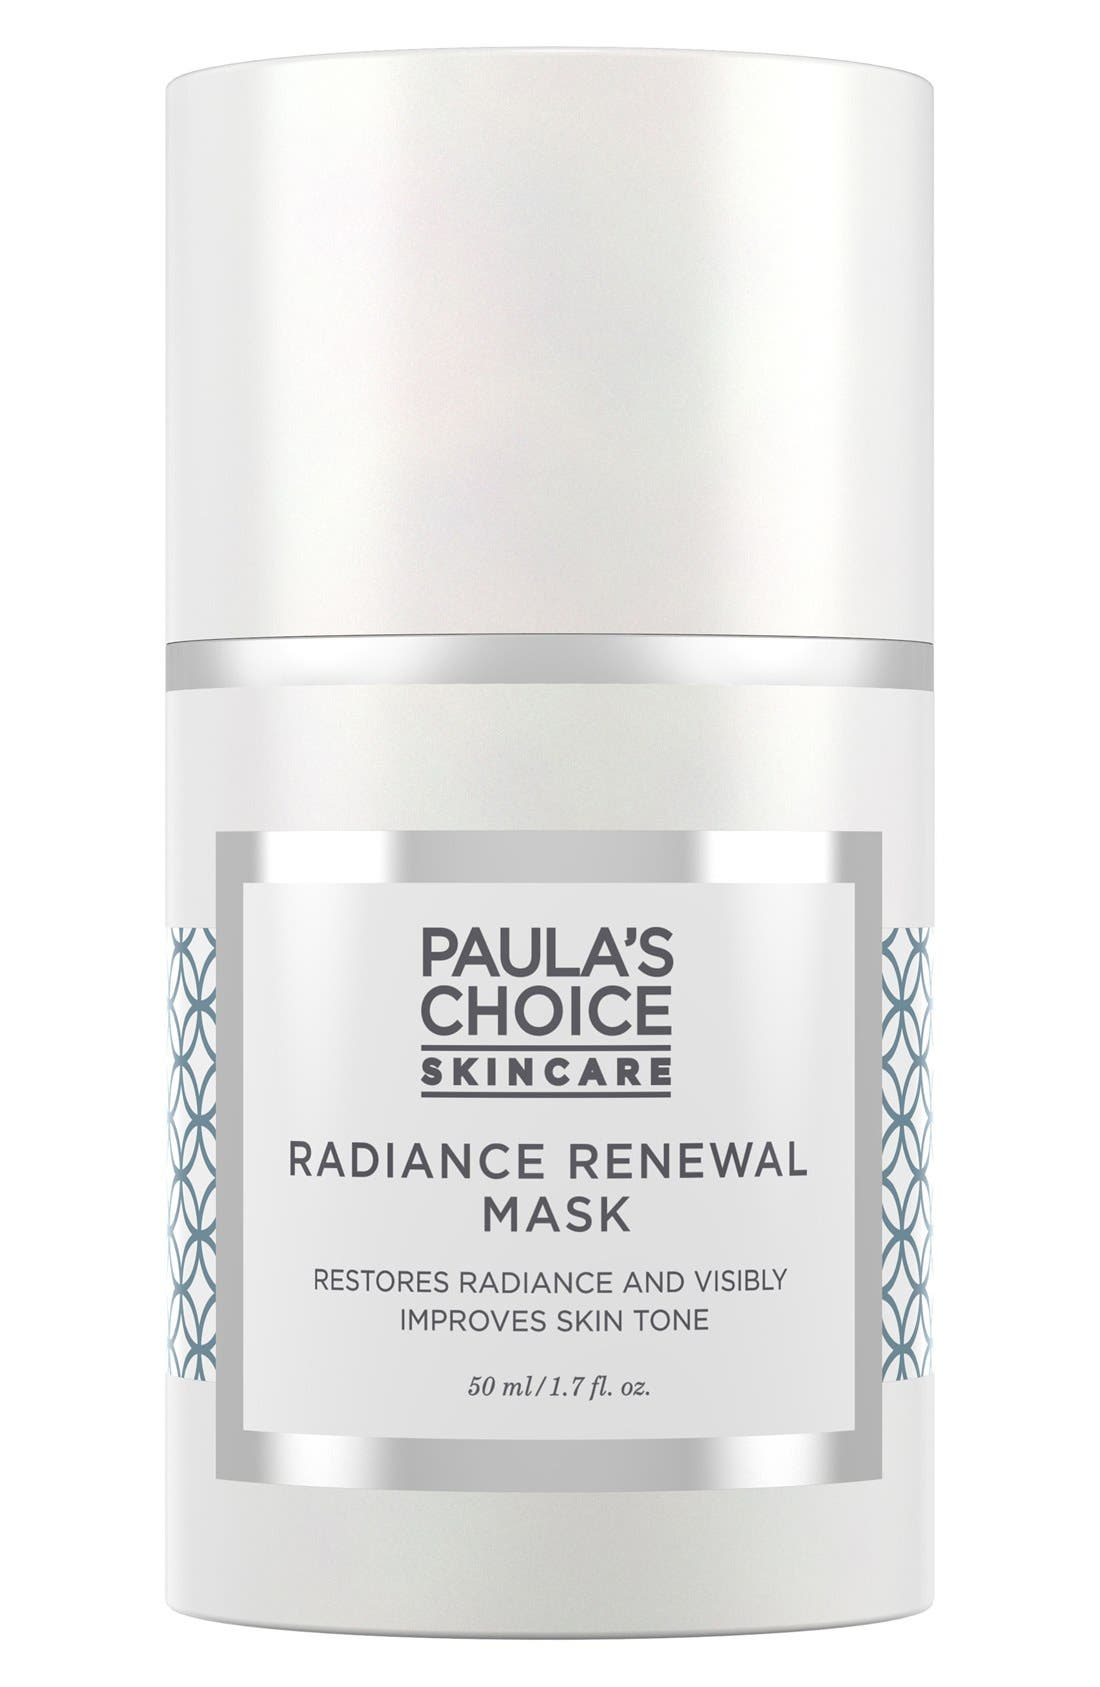 Paula's Choice Radiance Renewal Mask